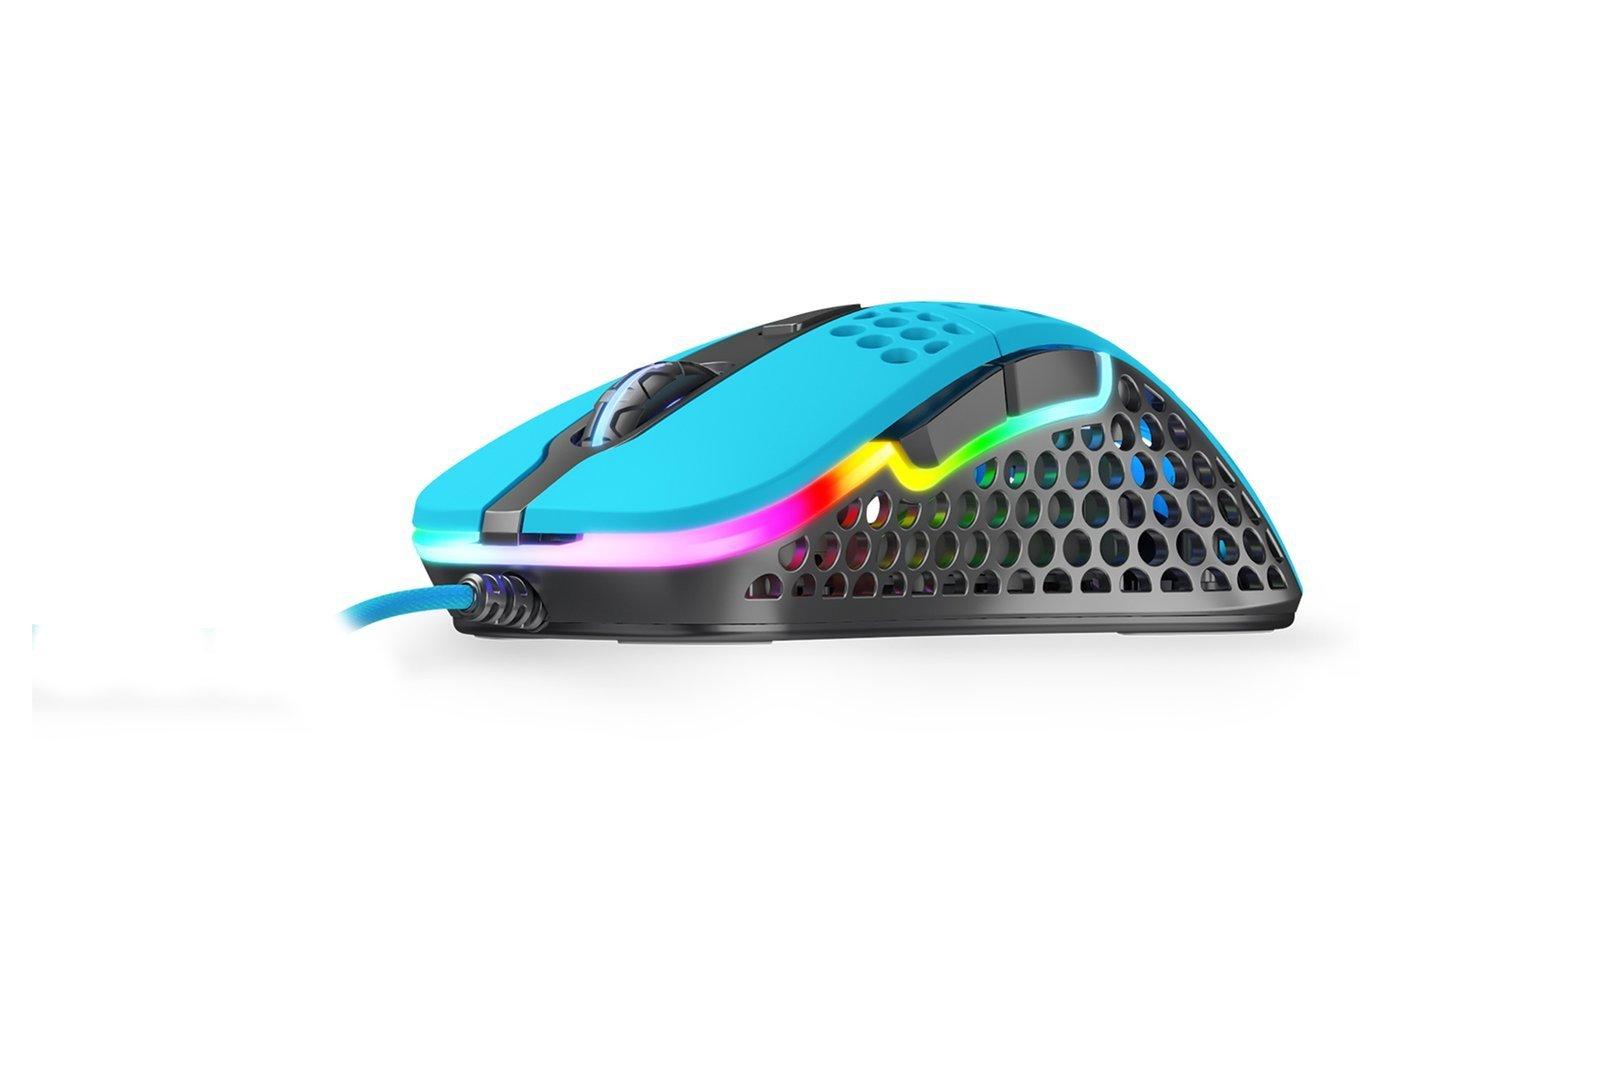 Ultra-Light Gaming Mouse Xtrfy M4 RGB Miami Blue 400-16kDPI